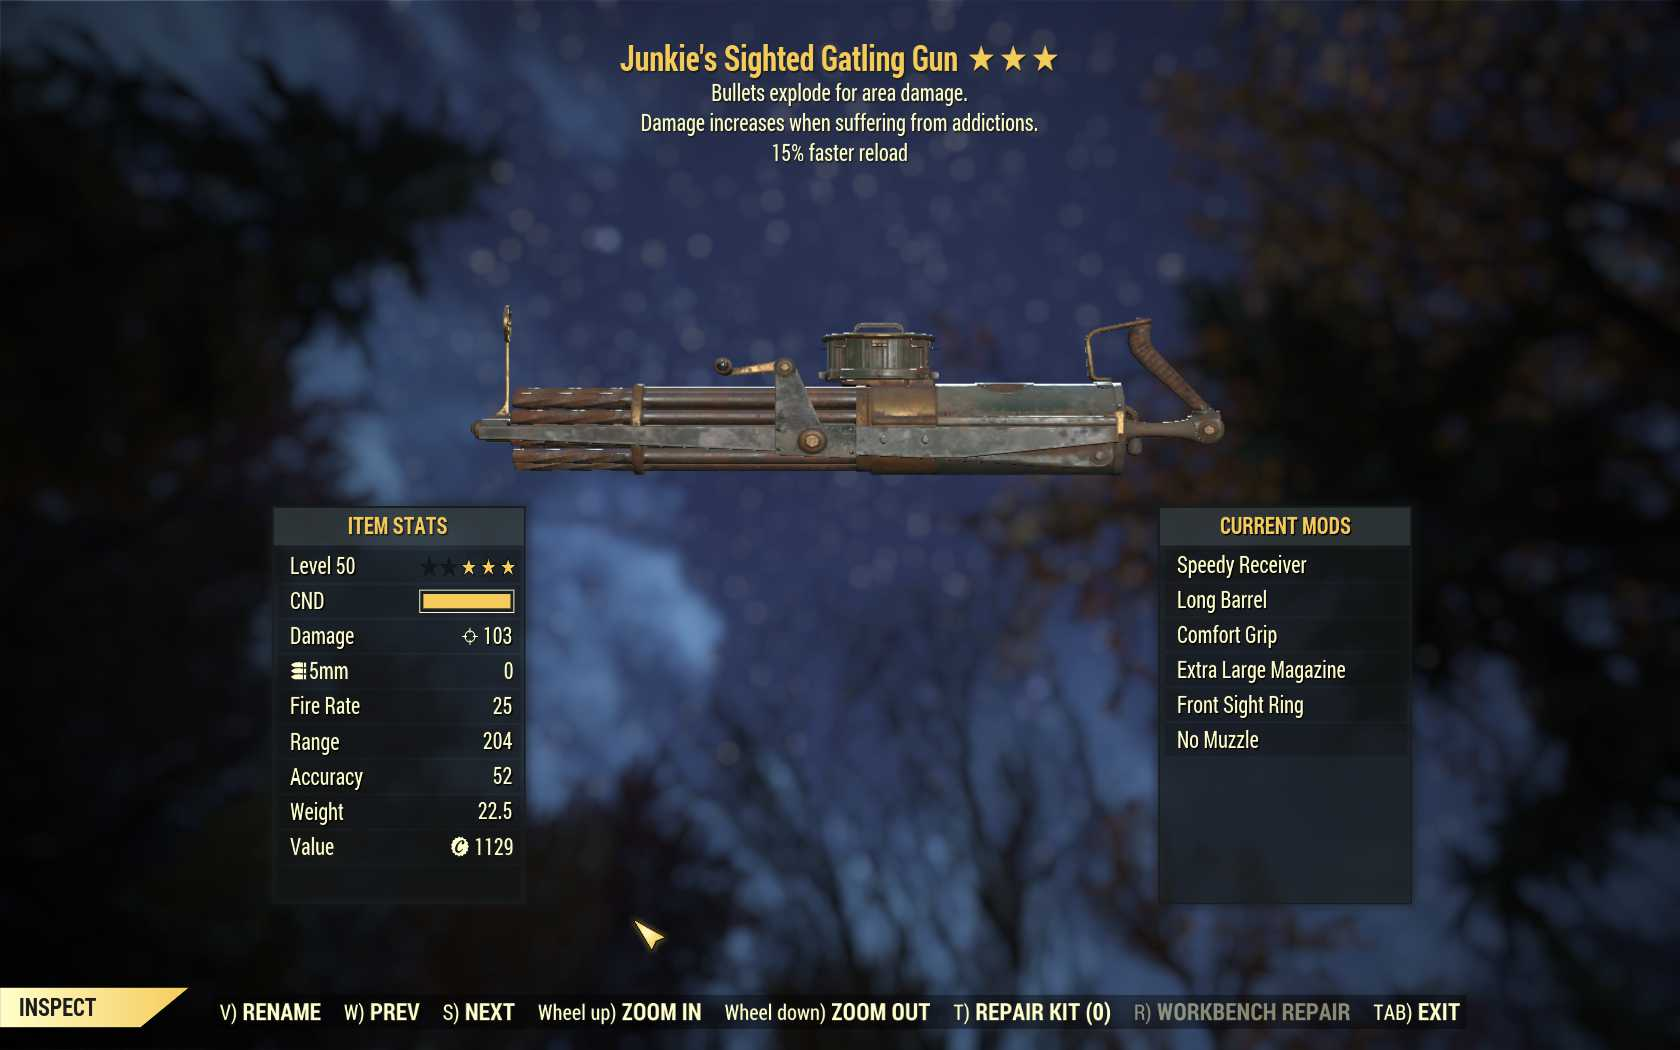 Junkie's Explosive Gatling Gun (15% faster reload)